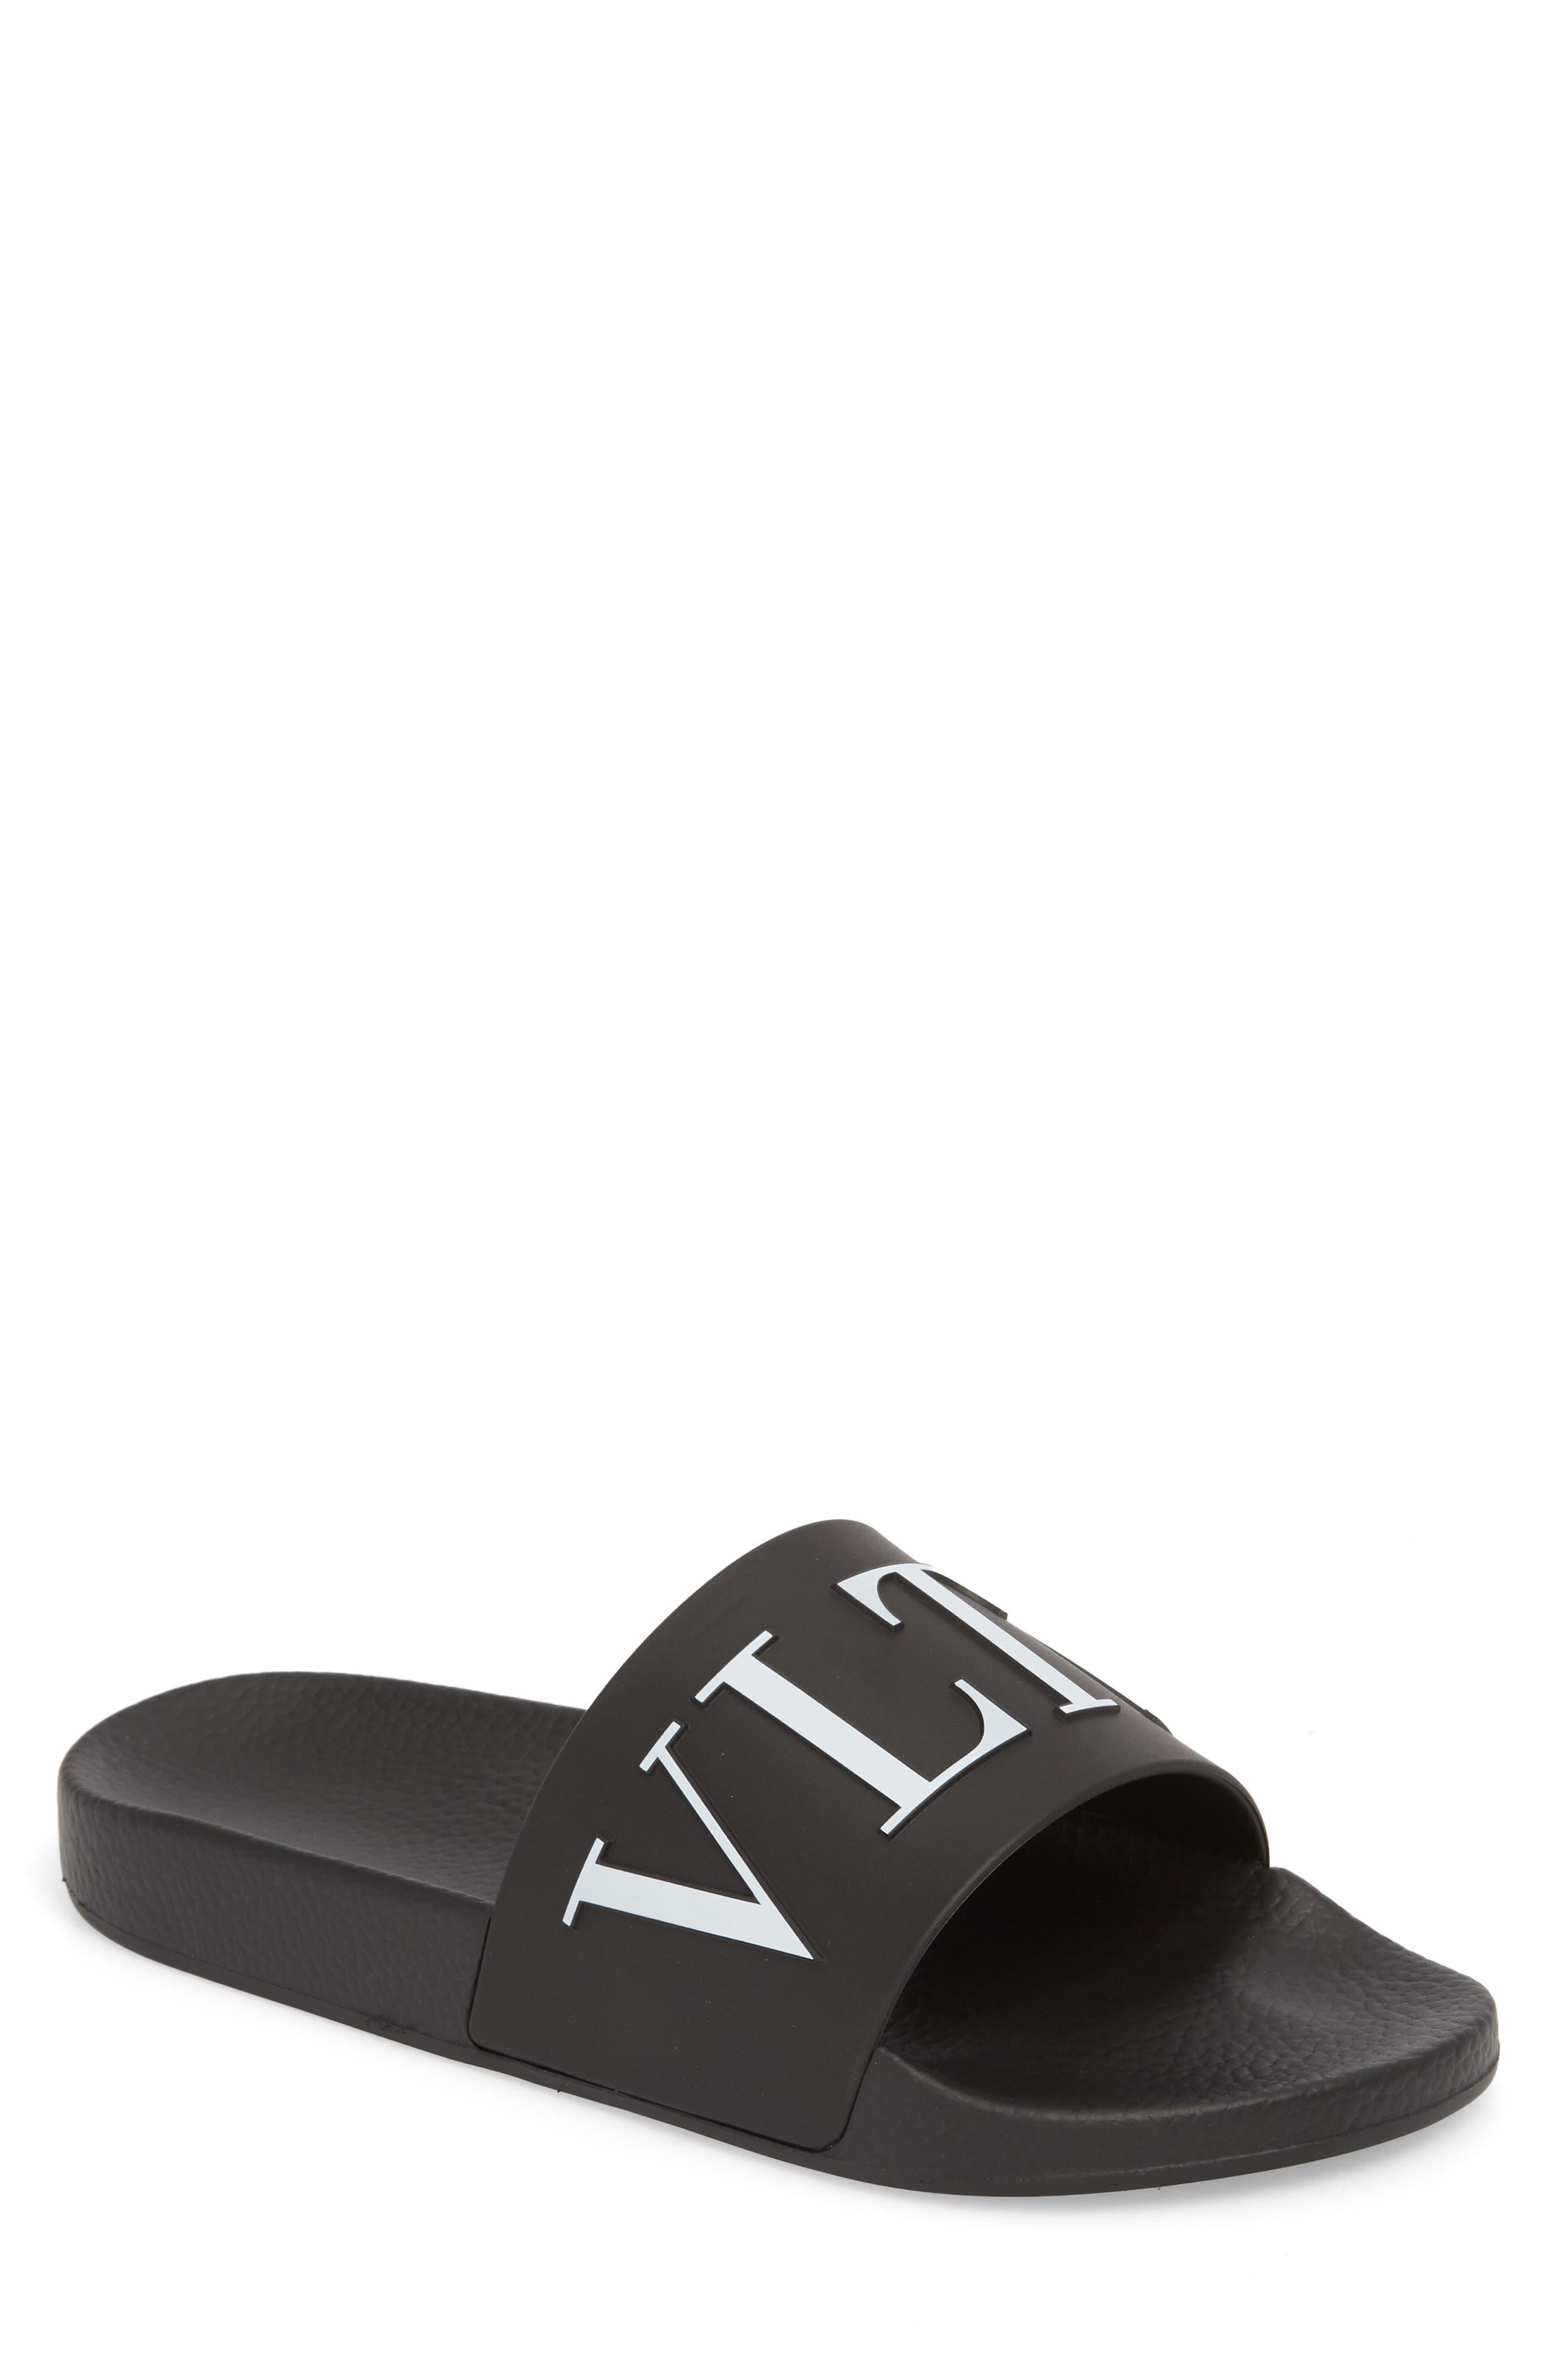 Slide Sandal,                             Main thumbnail 1, color,                             Black/ White